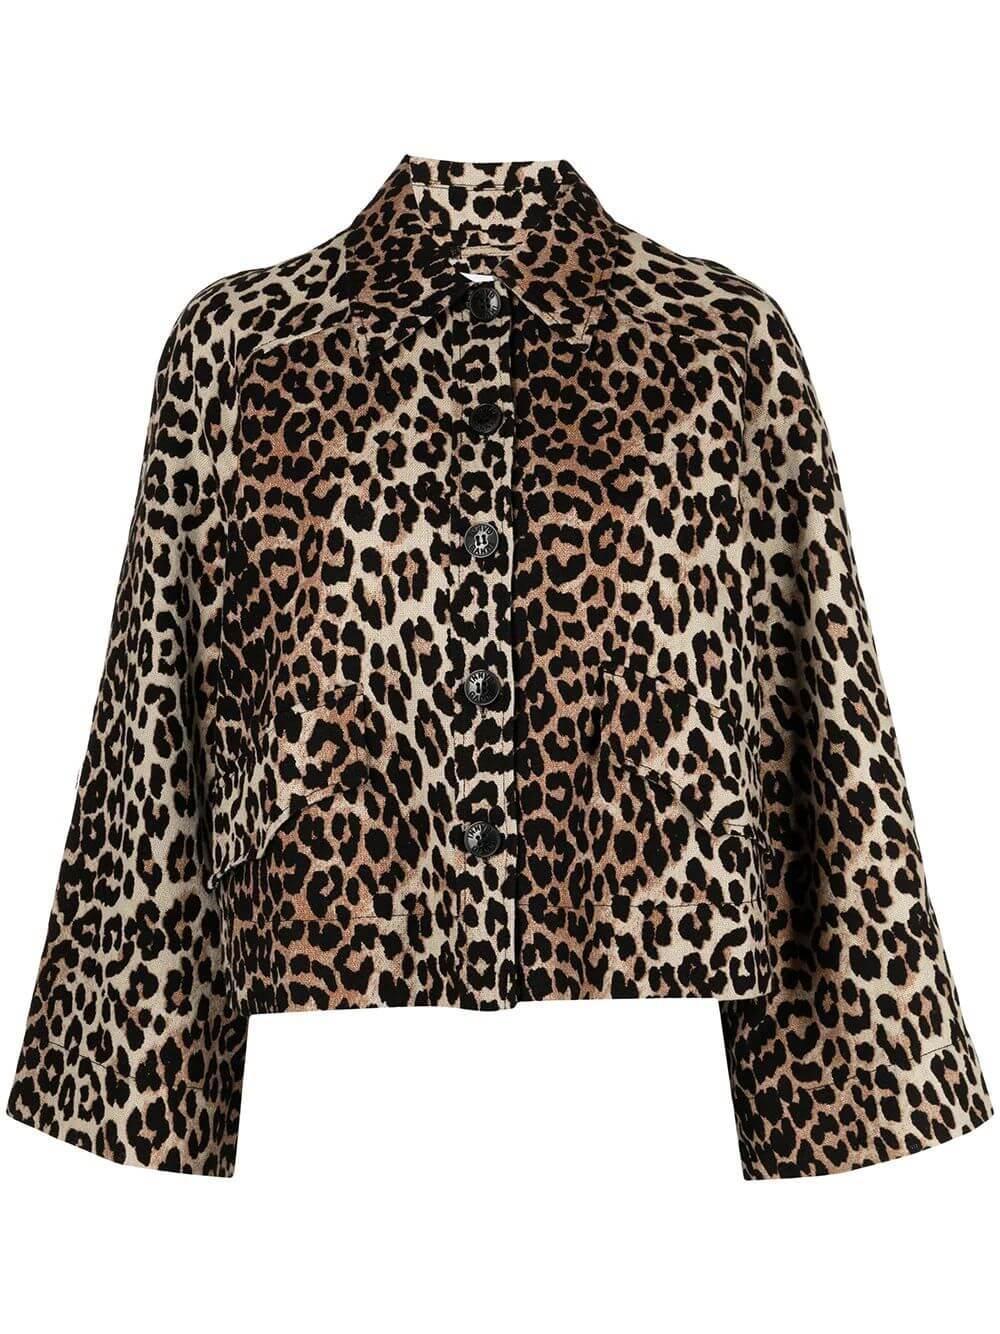 Linen Canvas Leopard Print Jacket Item # F5956